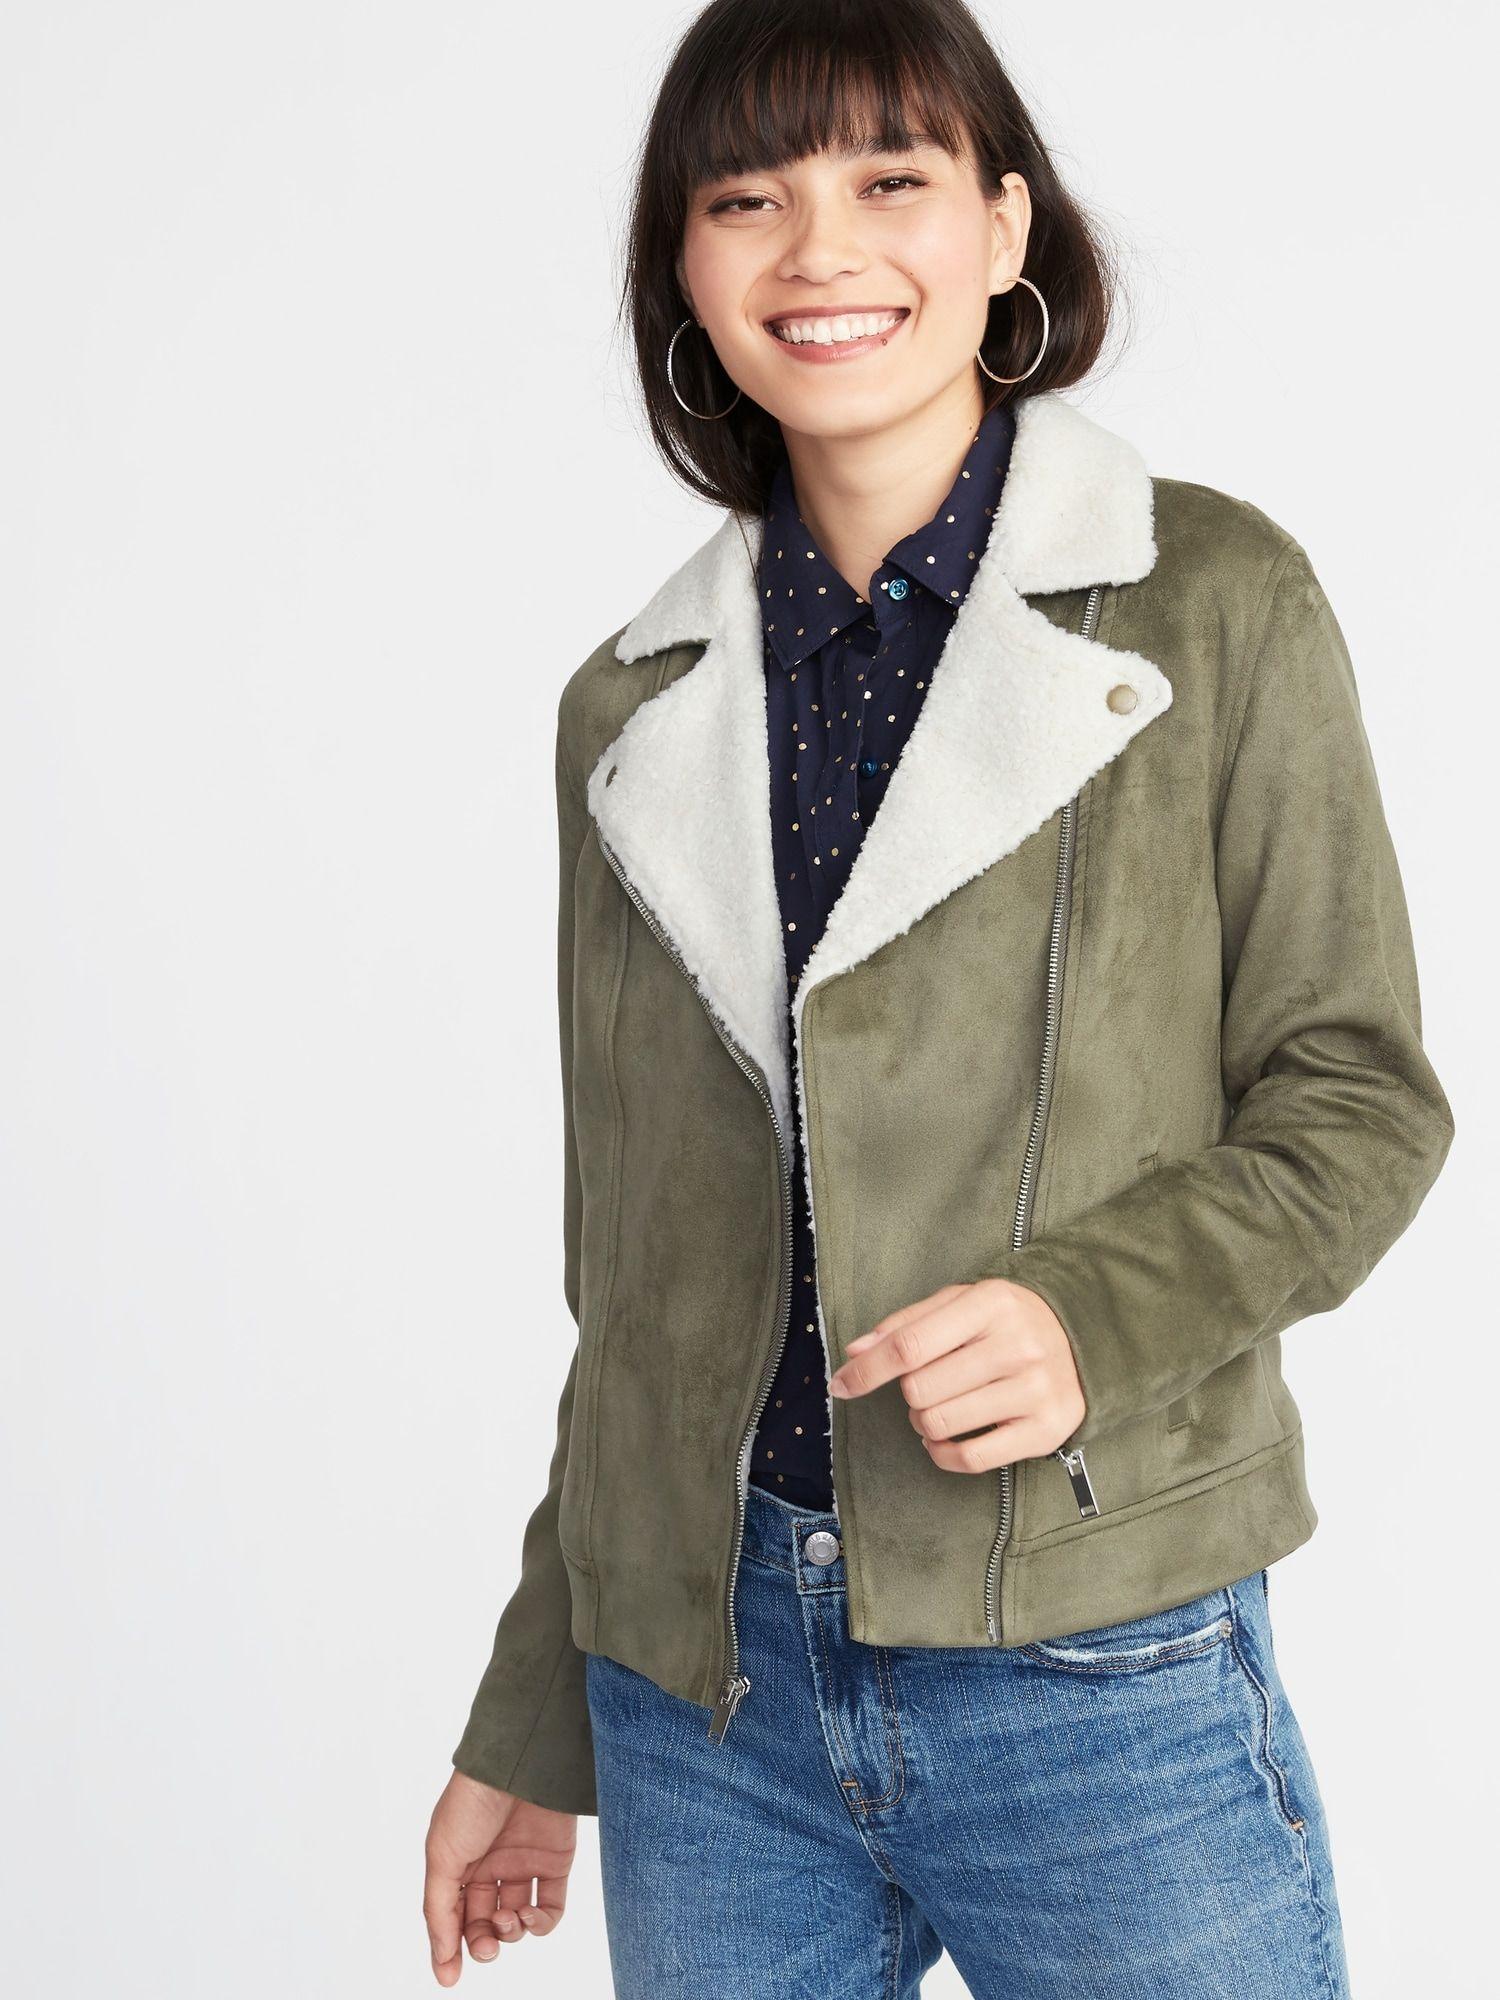 FauxSuede SherpaCollar Moto Jacket for Women Old Navy